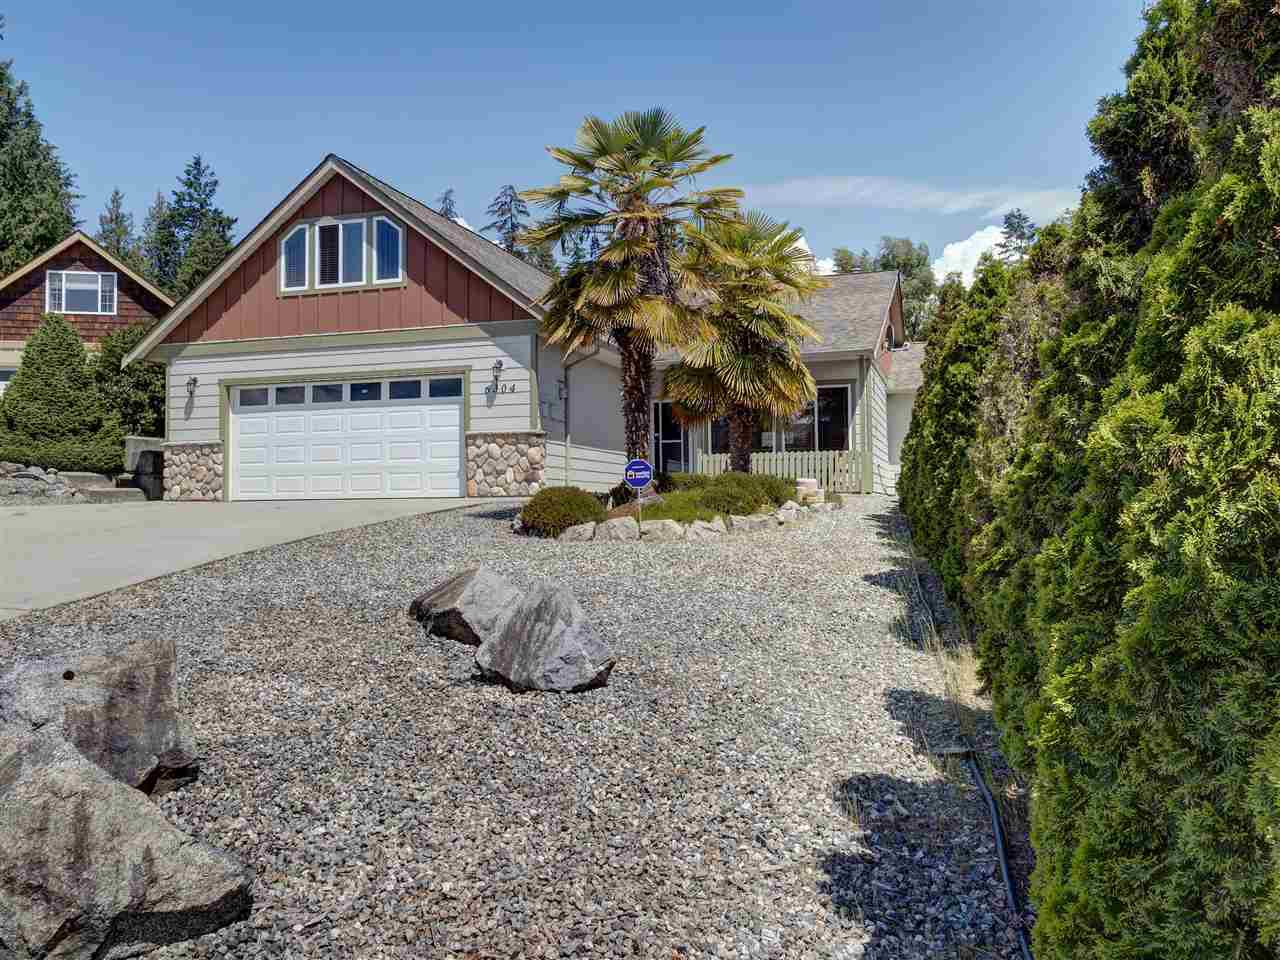 Main Photo: 6304 SAMRON Road in Sechelt: Sechelt District House for sale (Sunshine Coast)  : MLS®# R2469444